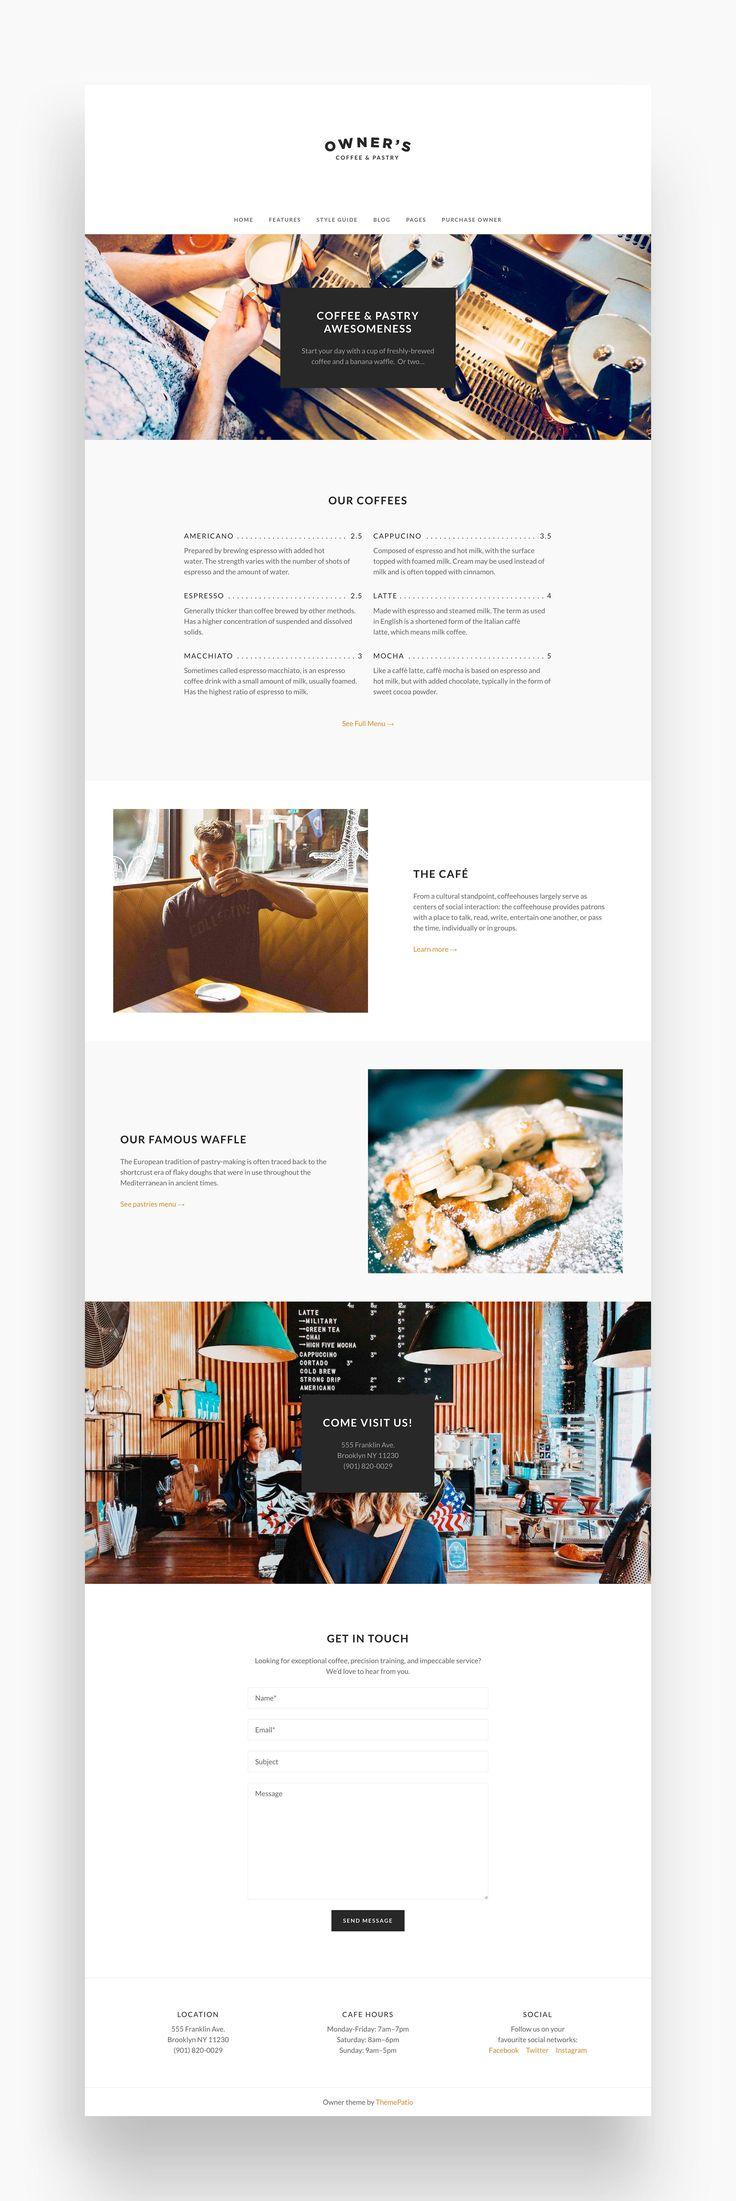 Owner – Business WordPress Theme by ThemePatio on @creativemarket